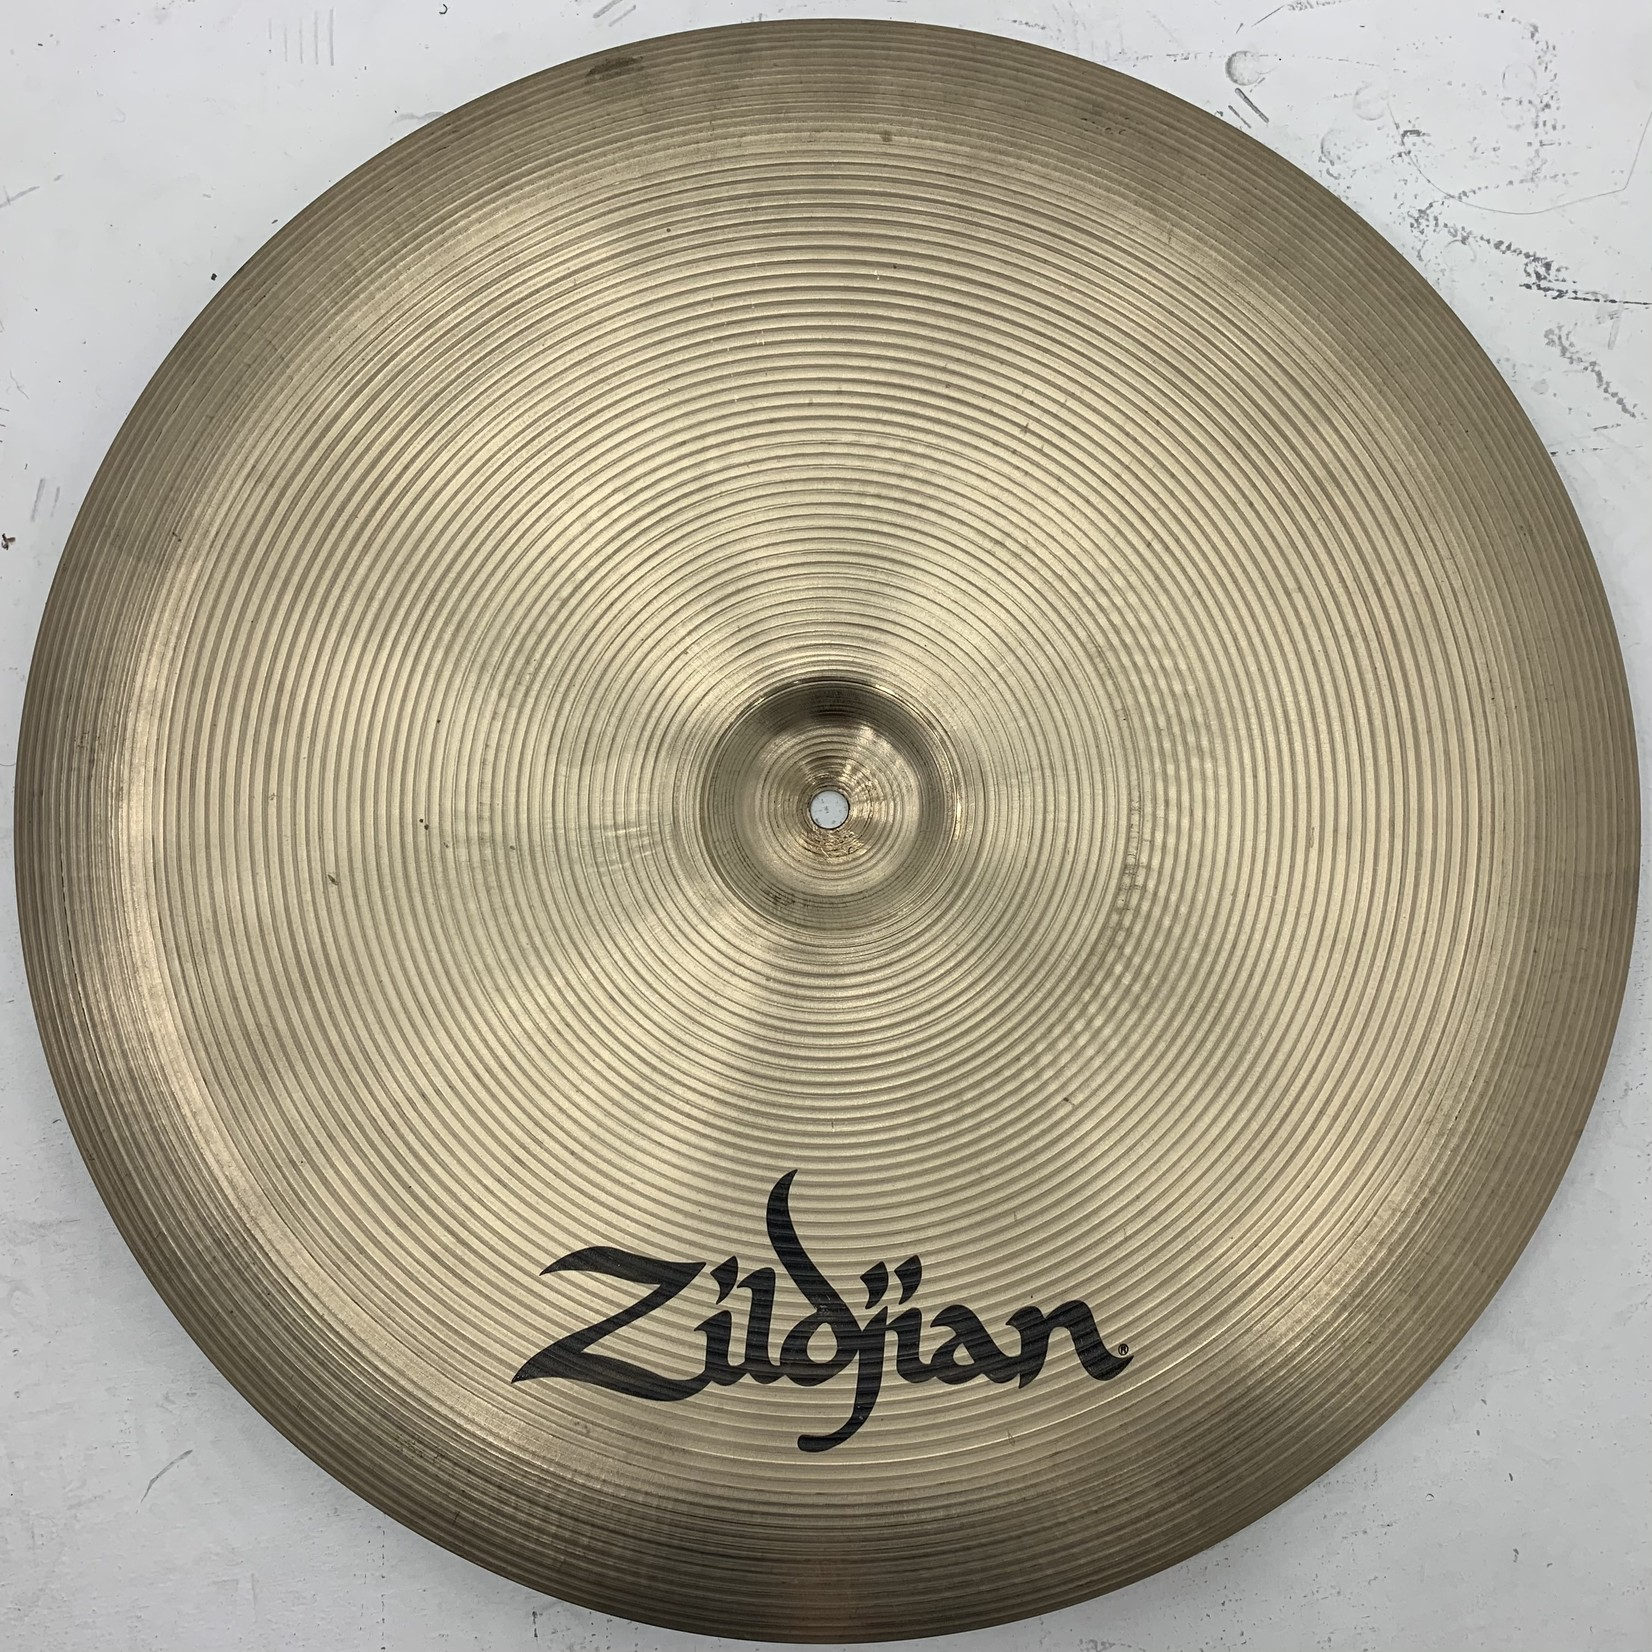 "USED Zildjian 20"" China Boy Low (Michael Wagener Collection)"